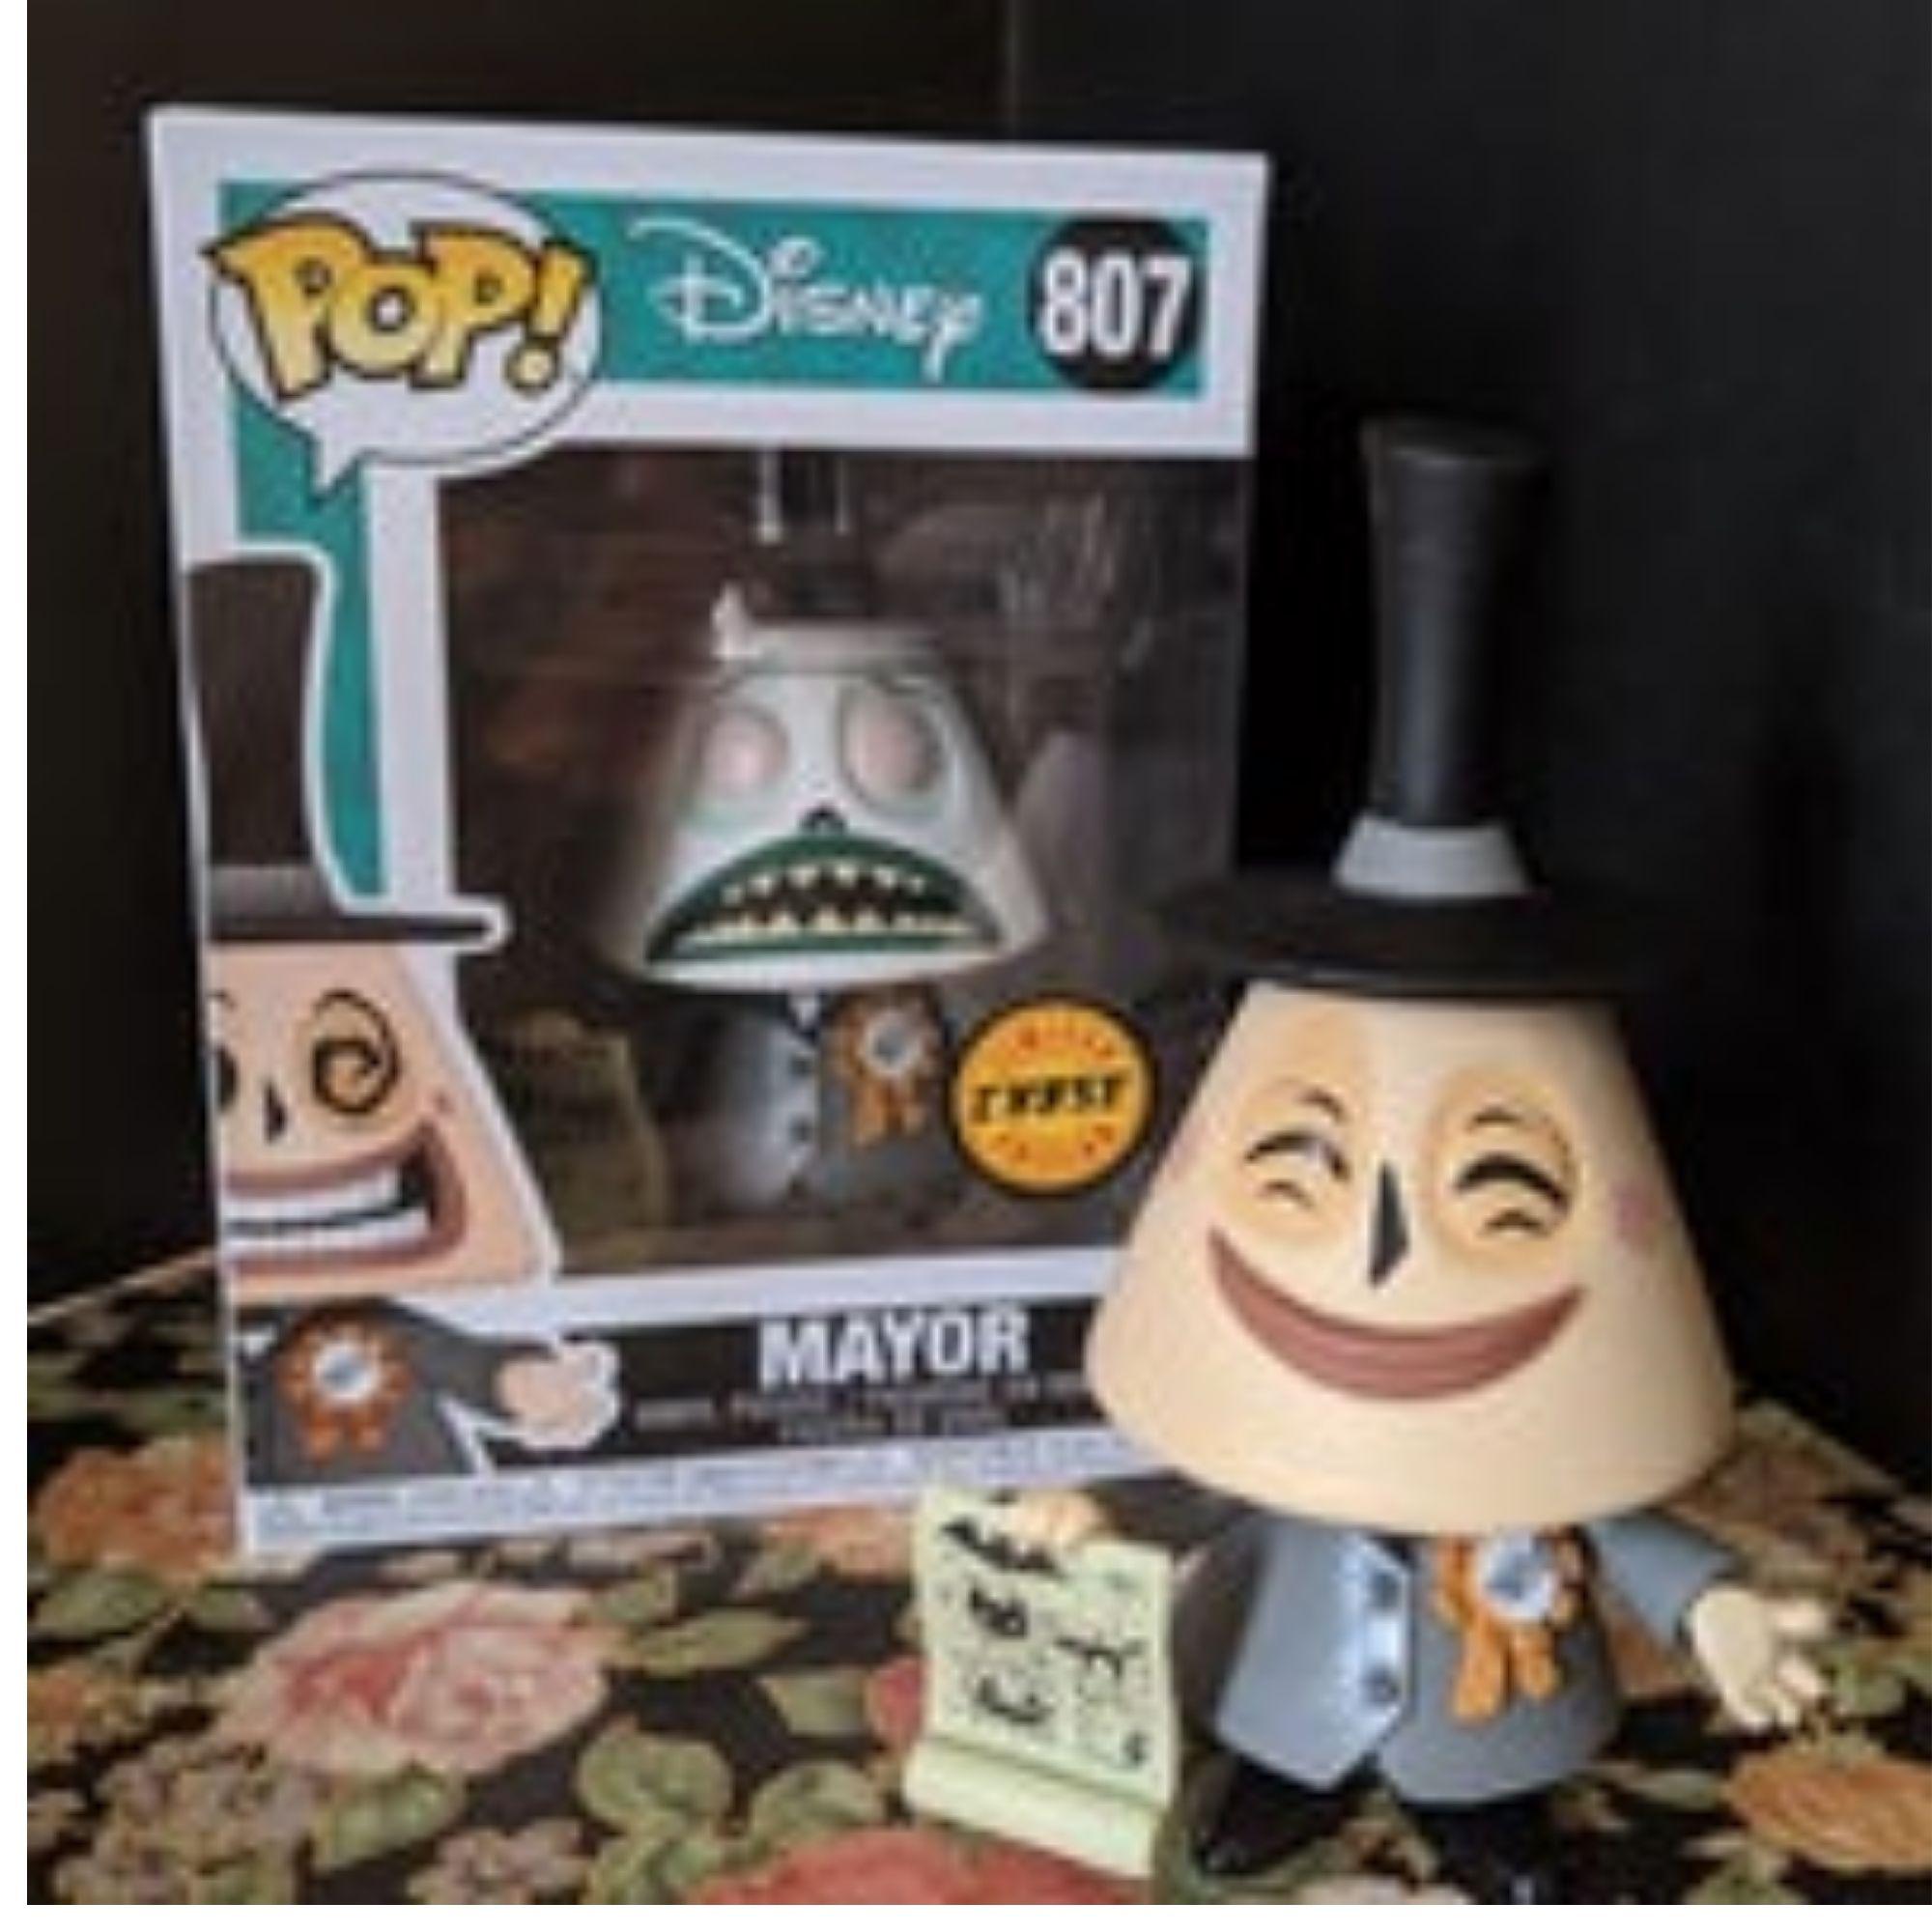 Funko Pop Disney Mayor Prefeito Chase #807  - Game Land Brinquedos